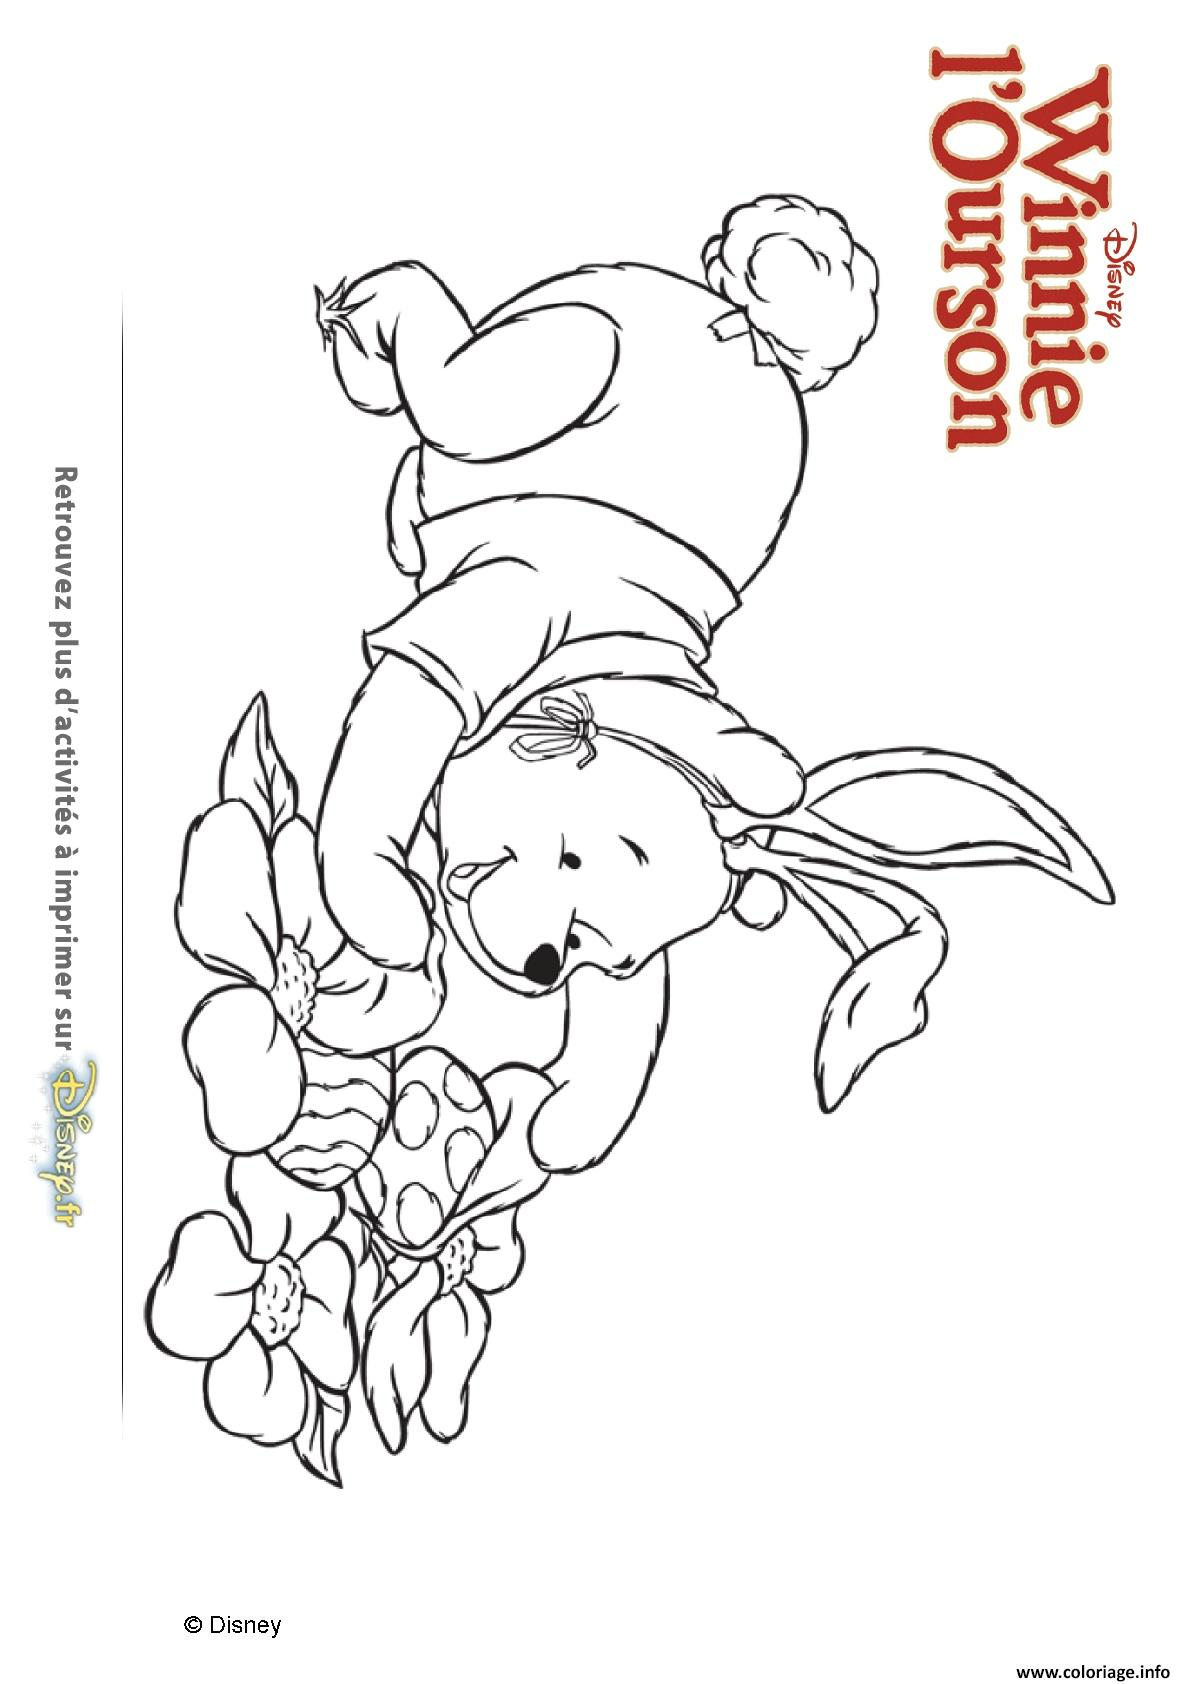 Coloriage winnie ourson chasse les oeufs - Dessin ourson a imprimer ...